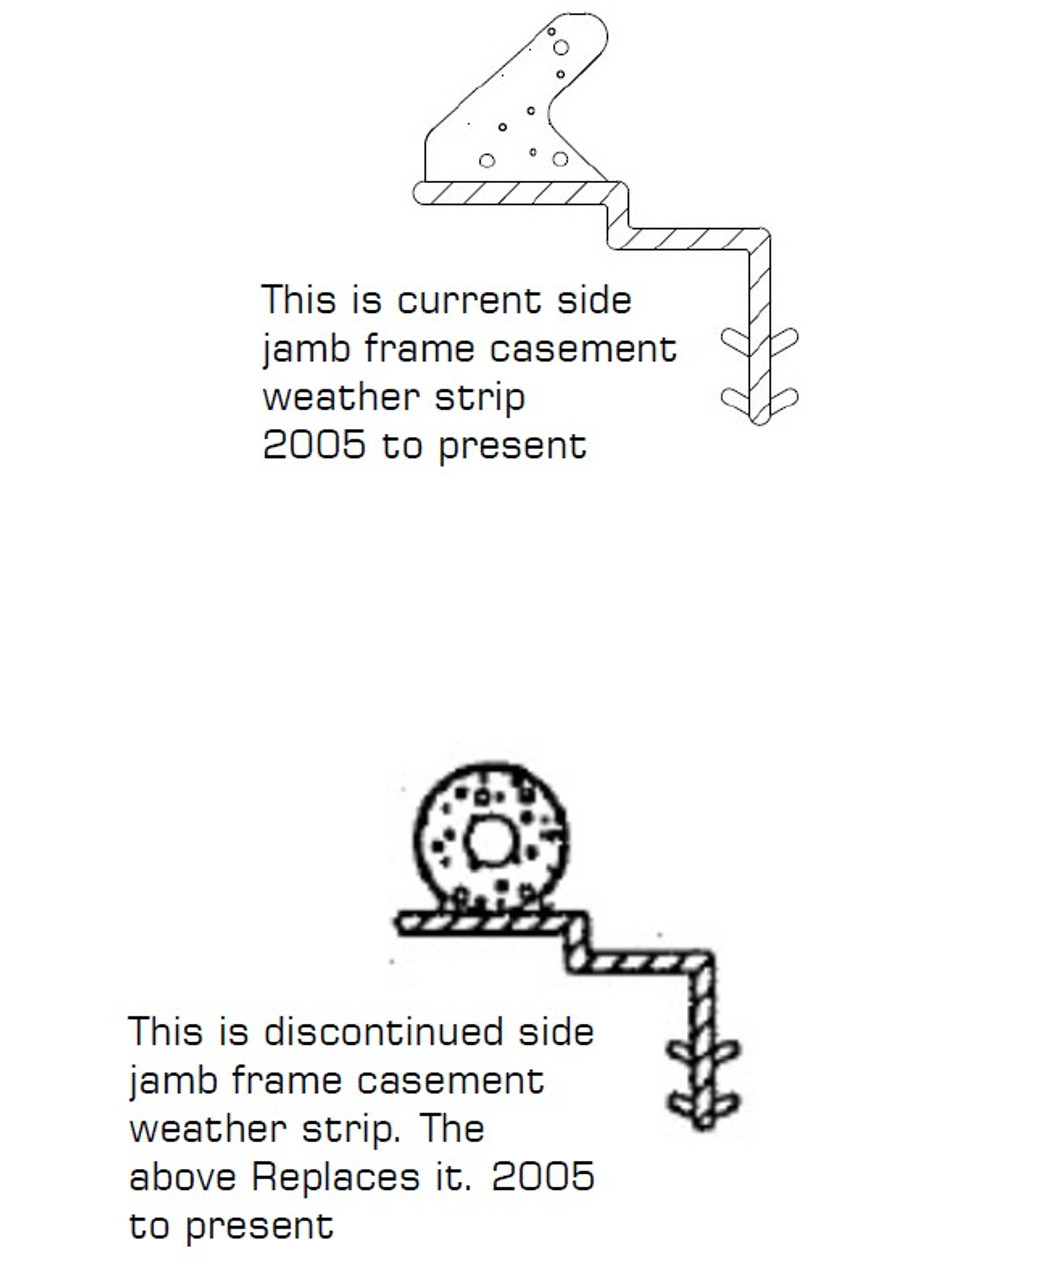 72'' pieces Casement Frame  Weather Strip June 2005  to Present-2784980